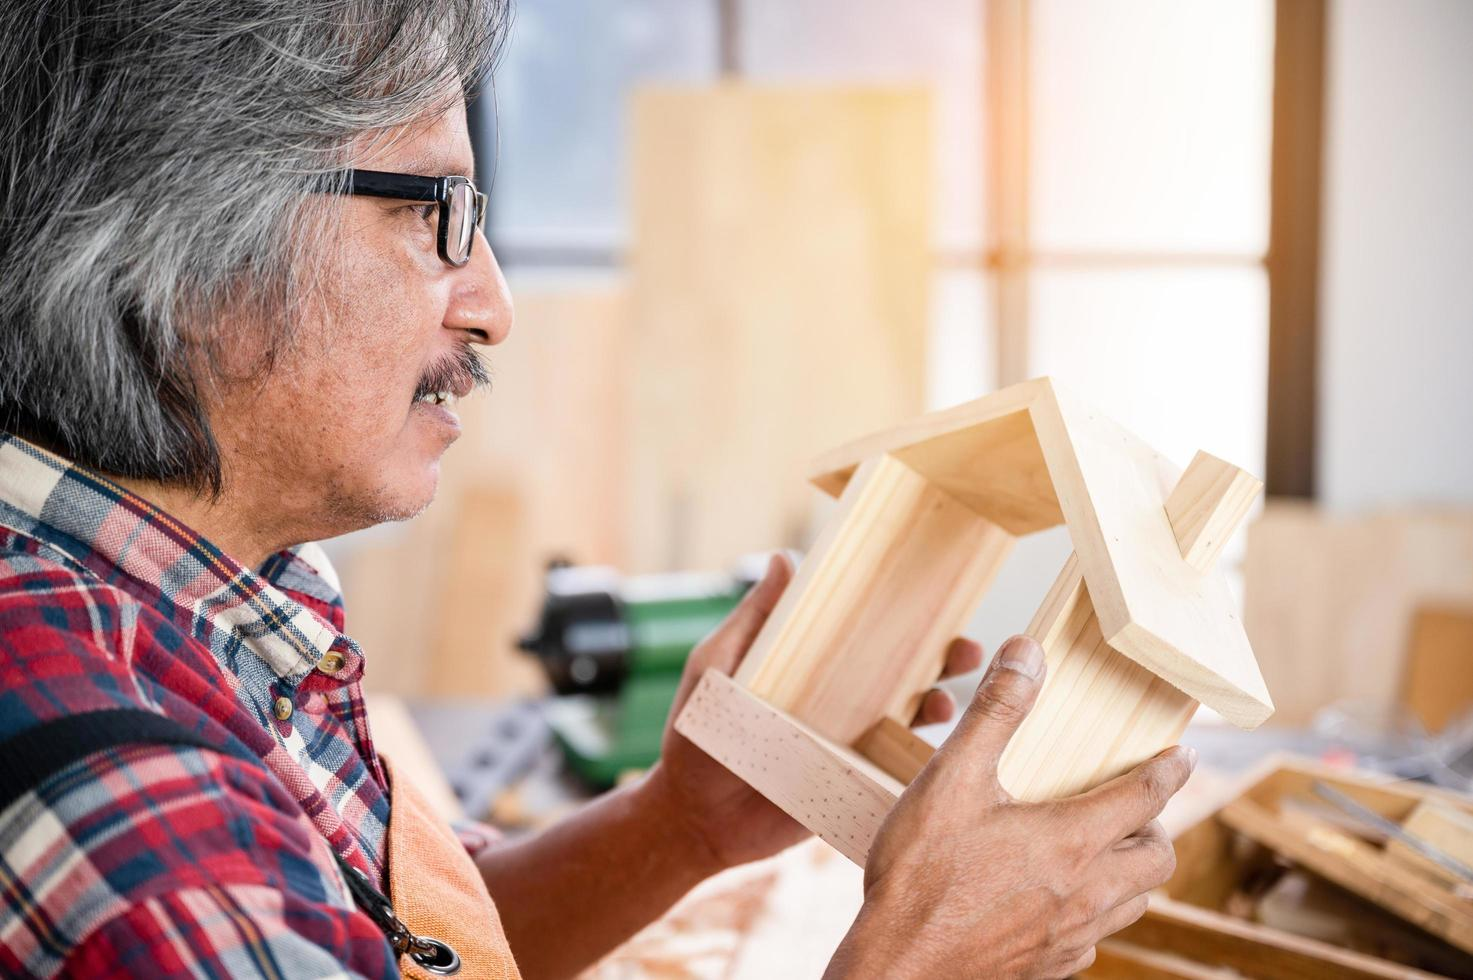 Man crafting a birdhouse  photo